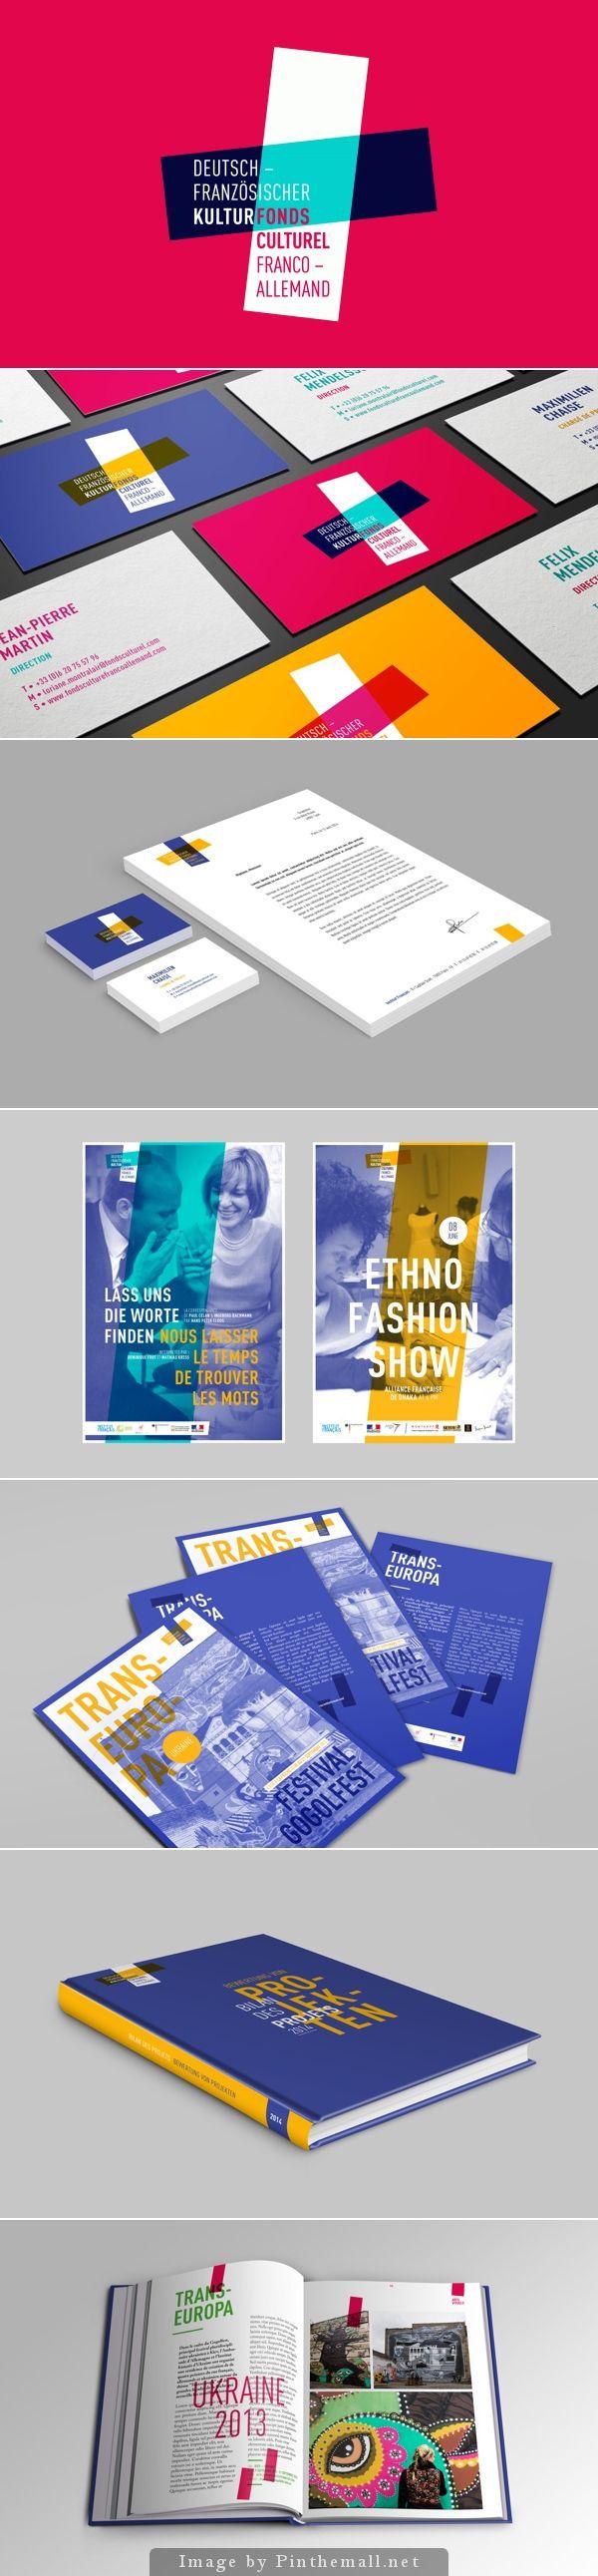 Franco-German Cultural Fund - Brand Identity - Graphéine